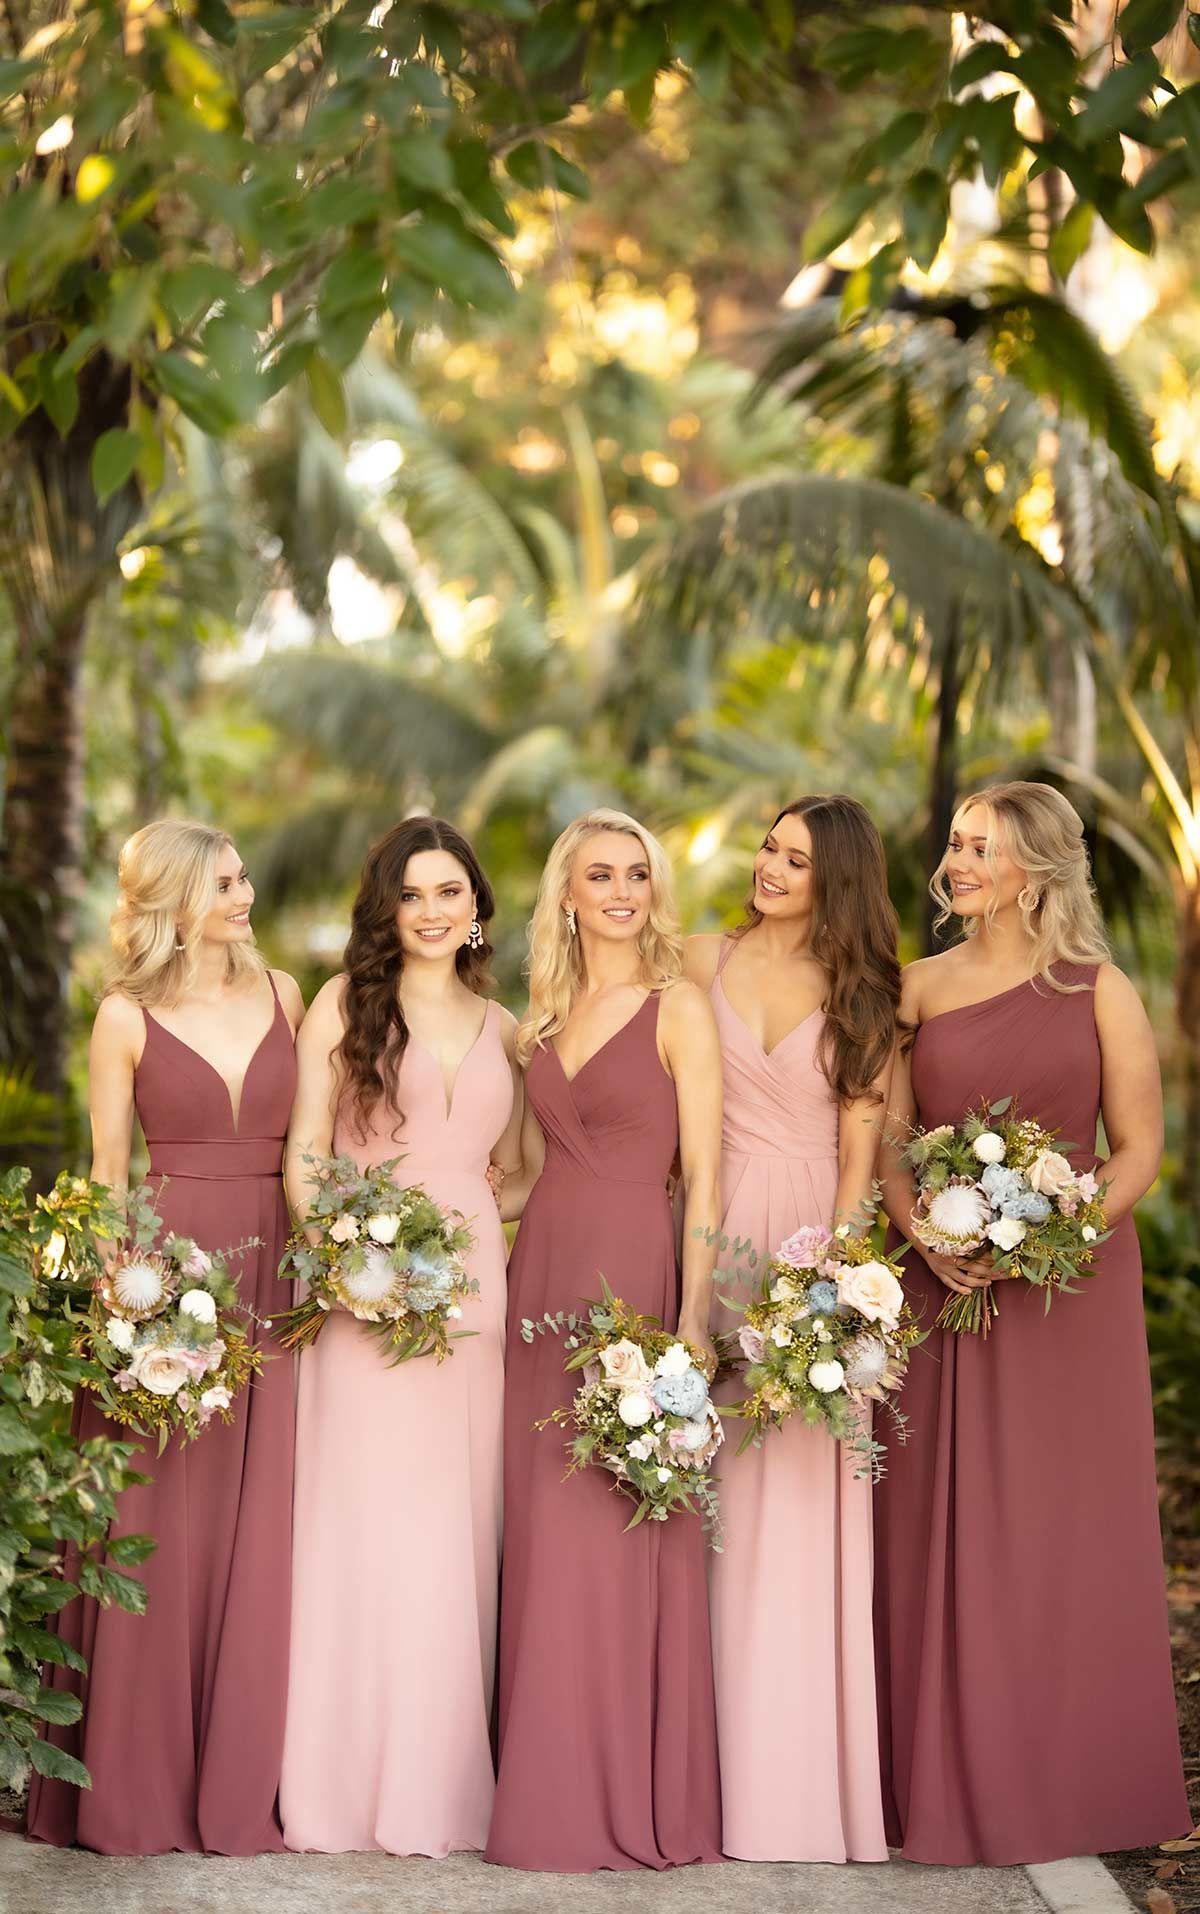 Sorella Vita Bridesmaid Dresses Rose Bridesmaid Dresses Summer Bridesmaid Dresses Wedding Bridesmaid Dresses [ 1914 x 1200 Pixel ]